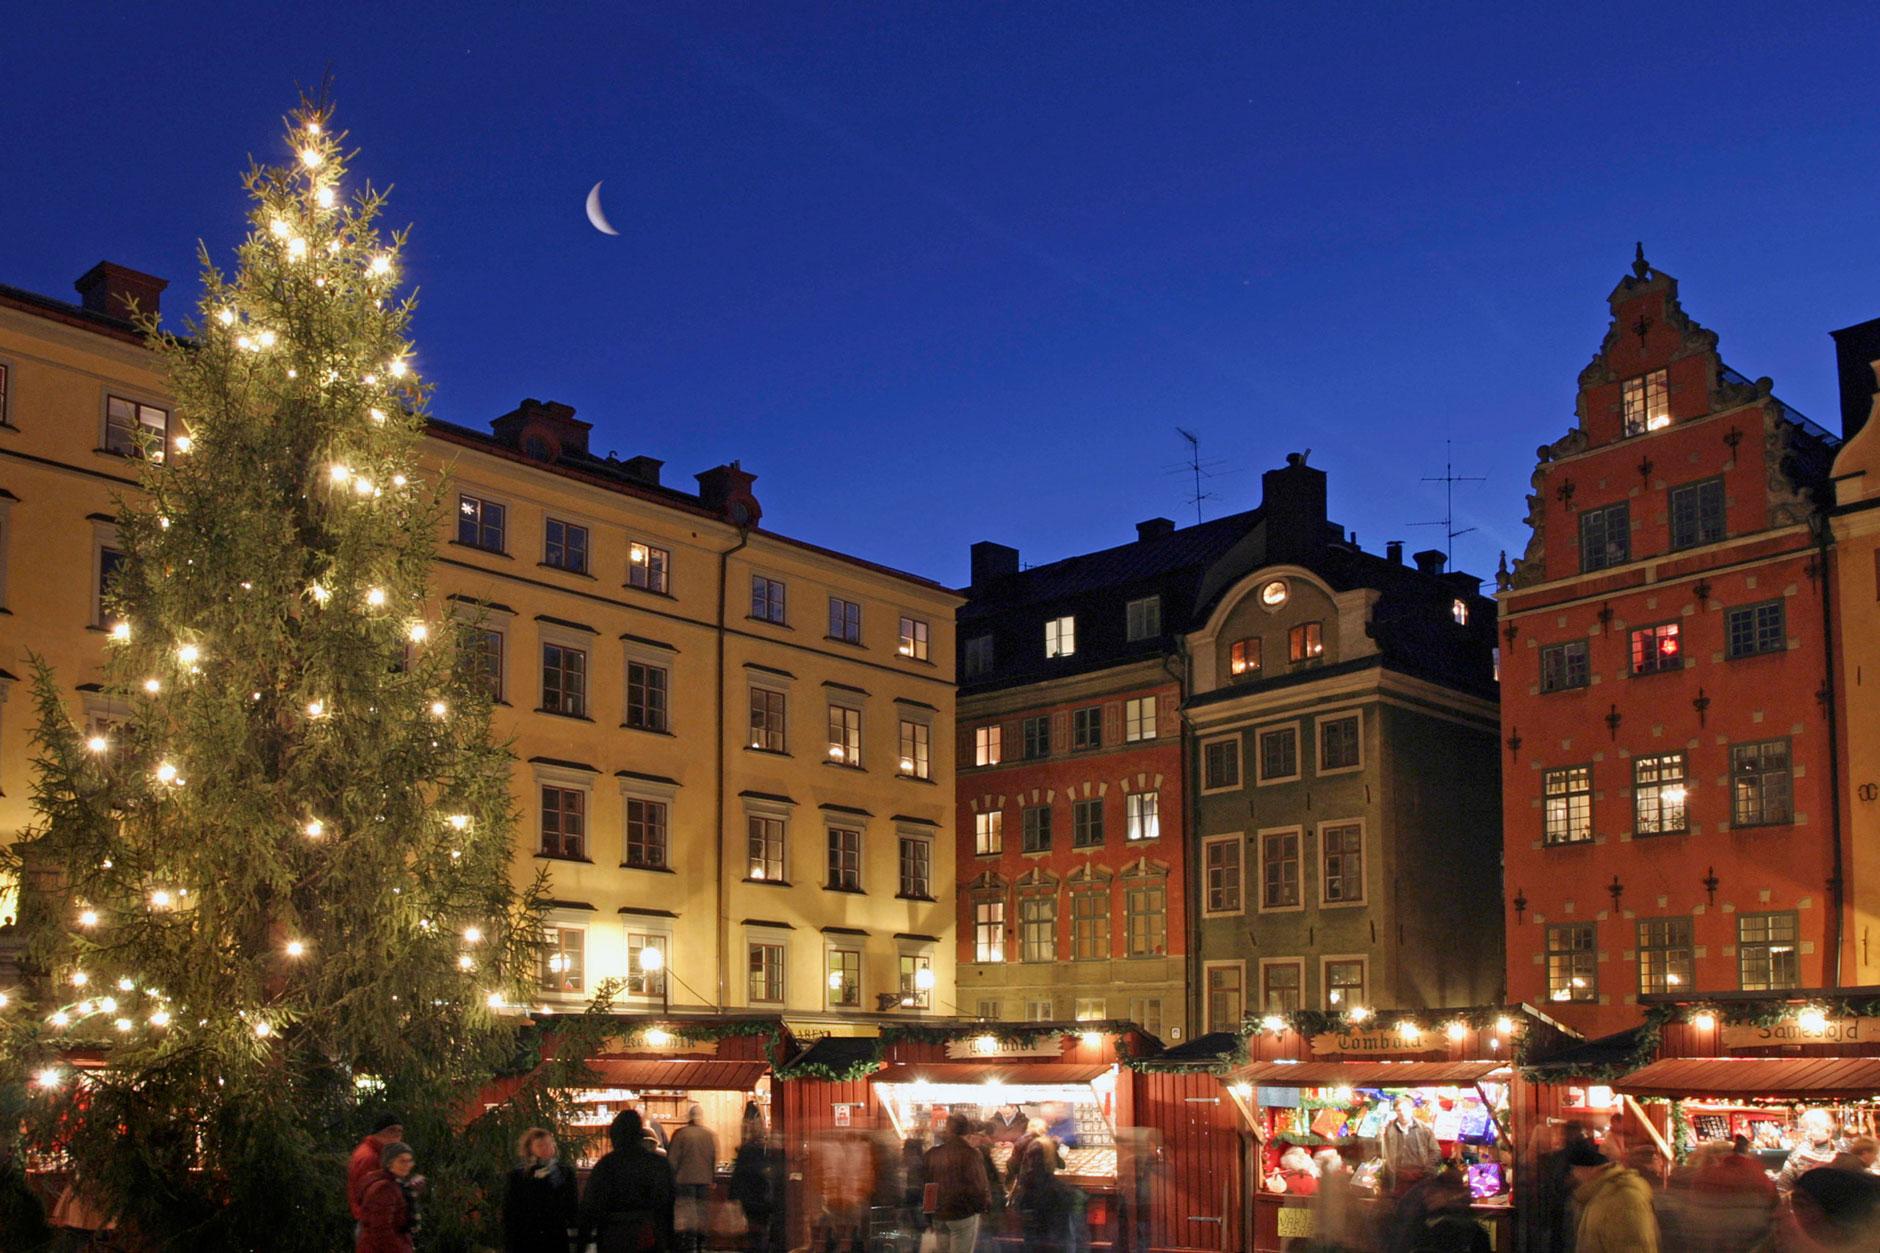 Natale a Stoccolma